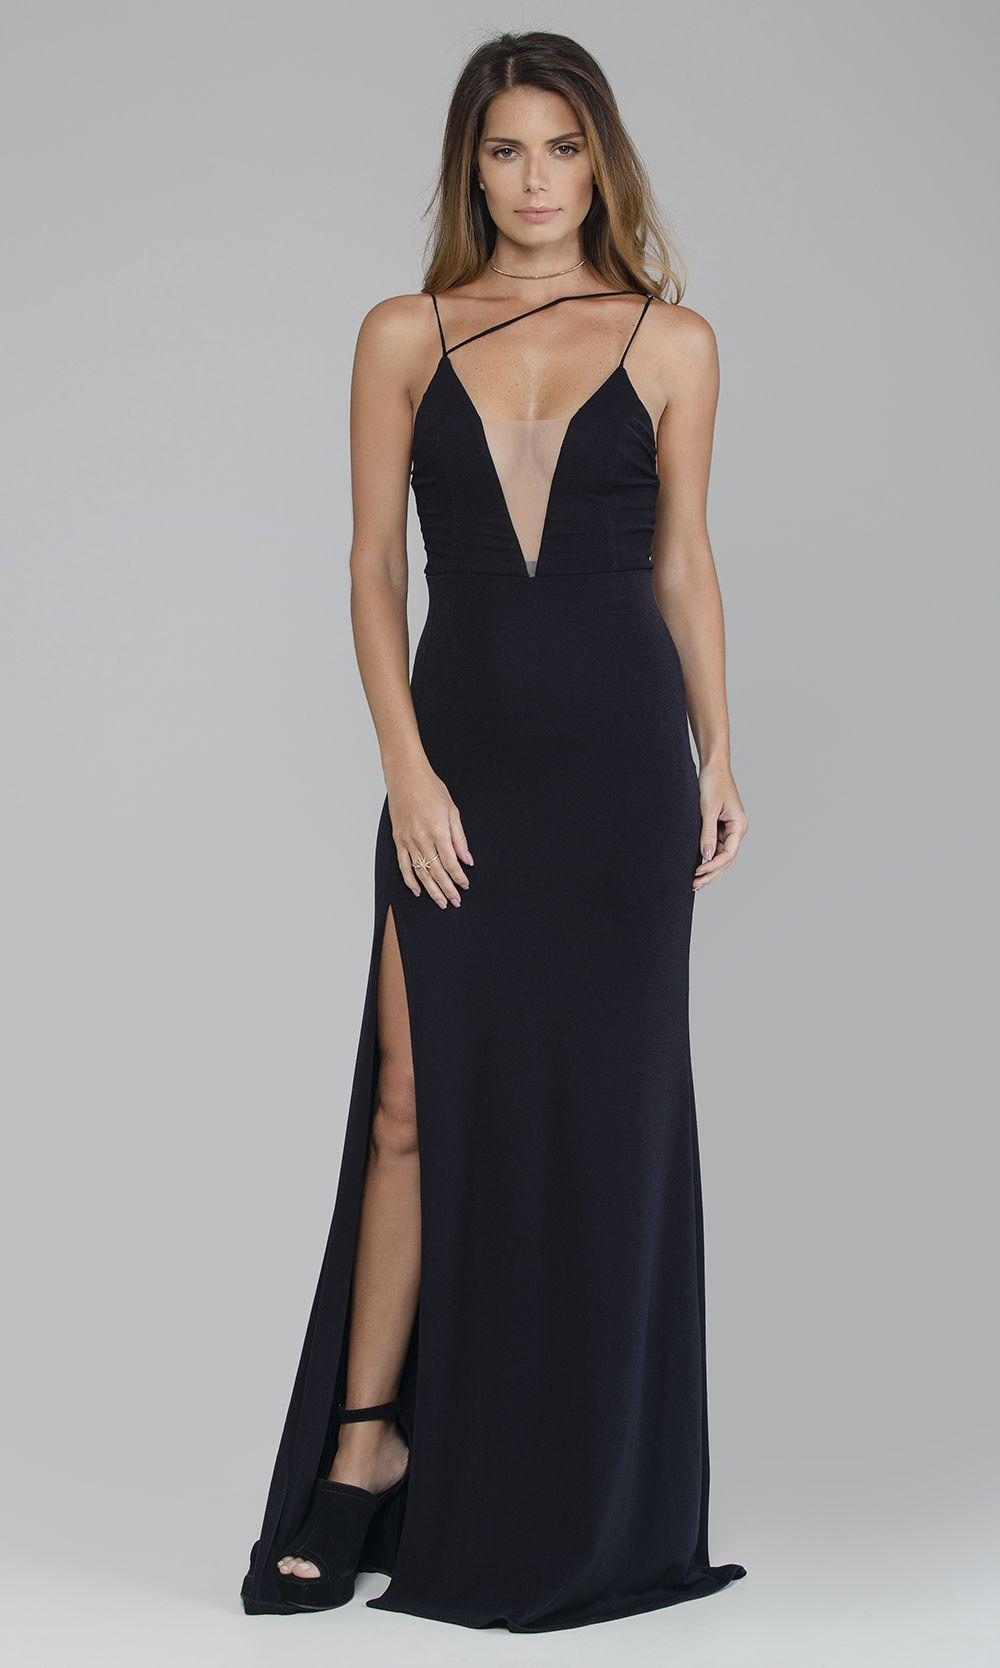 92585c499f Vestido Longo Fenda Alça Assimétrica - Agatha e-Store - Ágatha e-Store